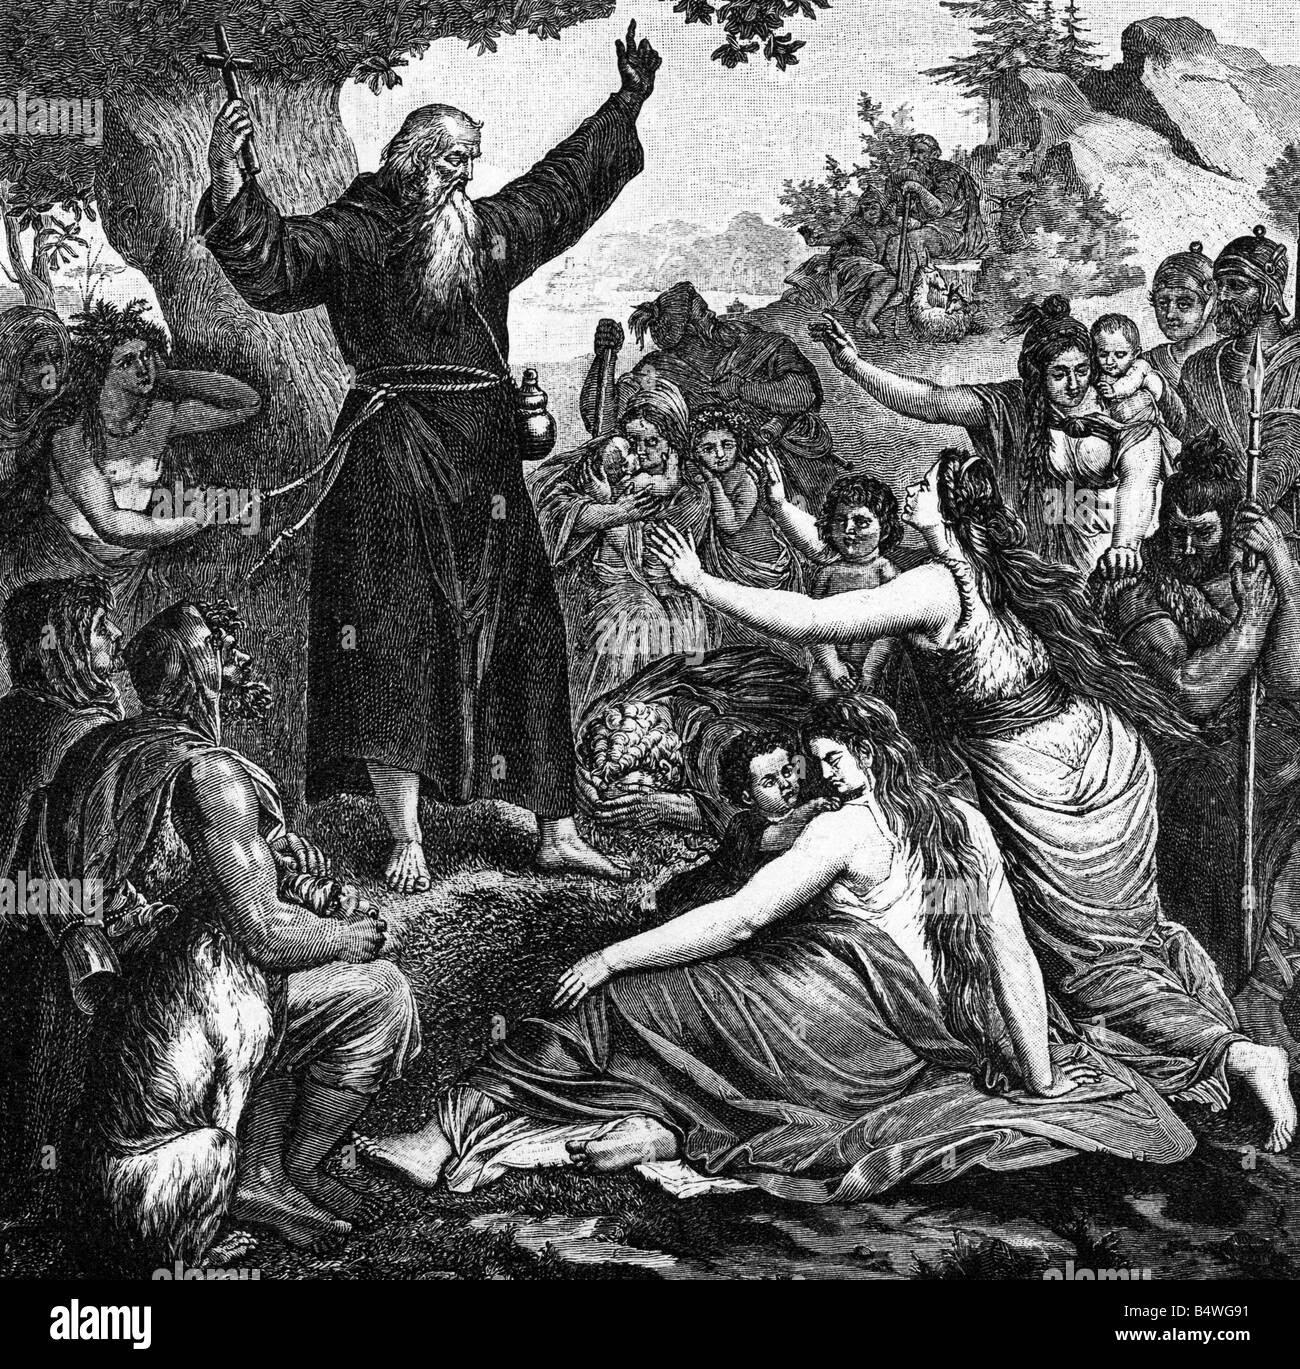 http://c8.alamy.com/comp/B4WG91/severinus-of-noricum-saint-missionary-circa-410-81482-full-length-B4WG91.jpg